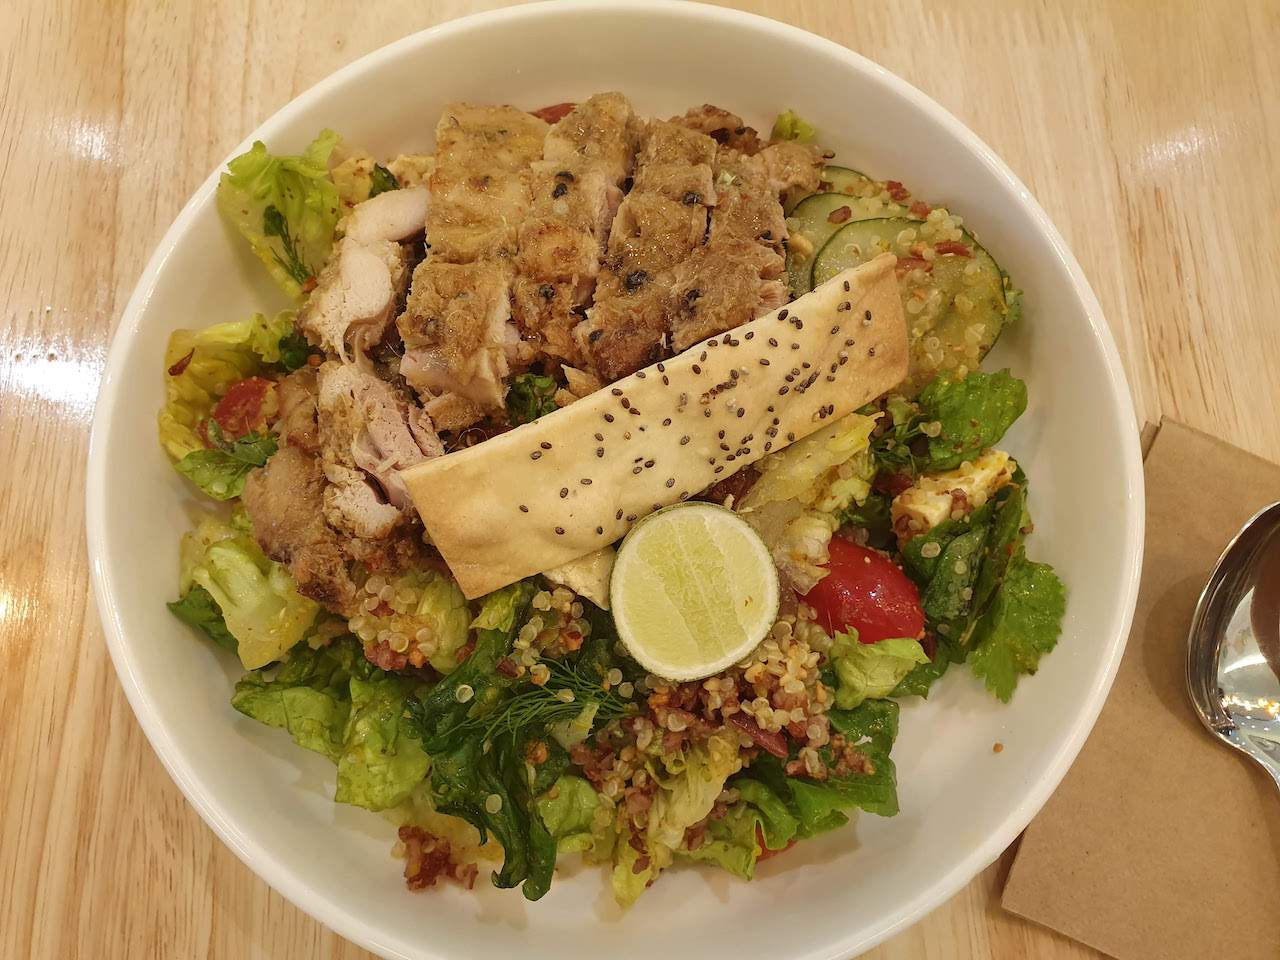 kuala lumpur healthy food saladtstaop pavillon